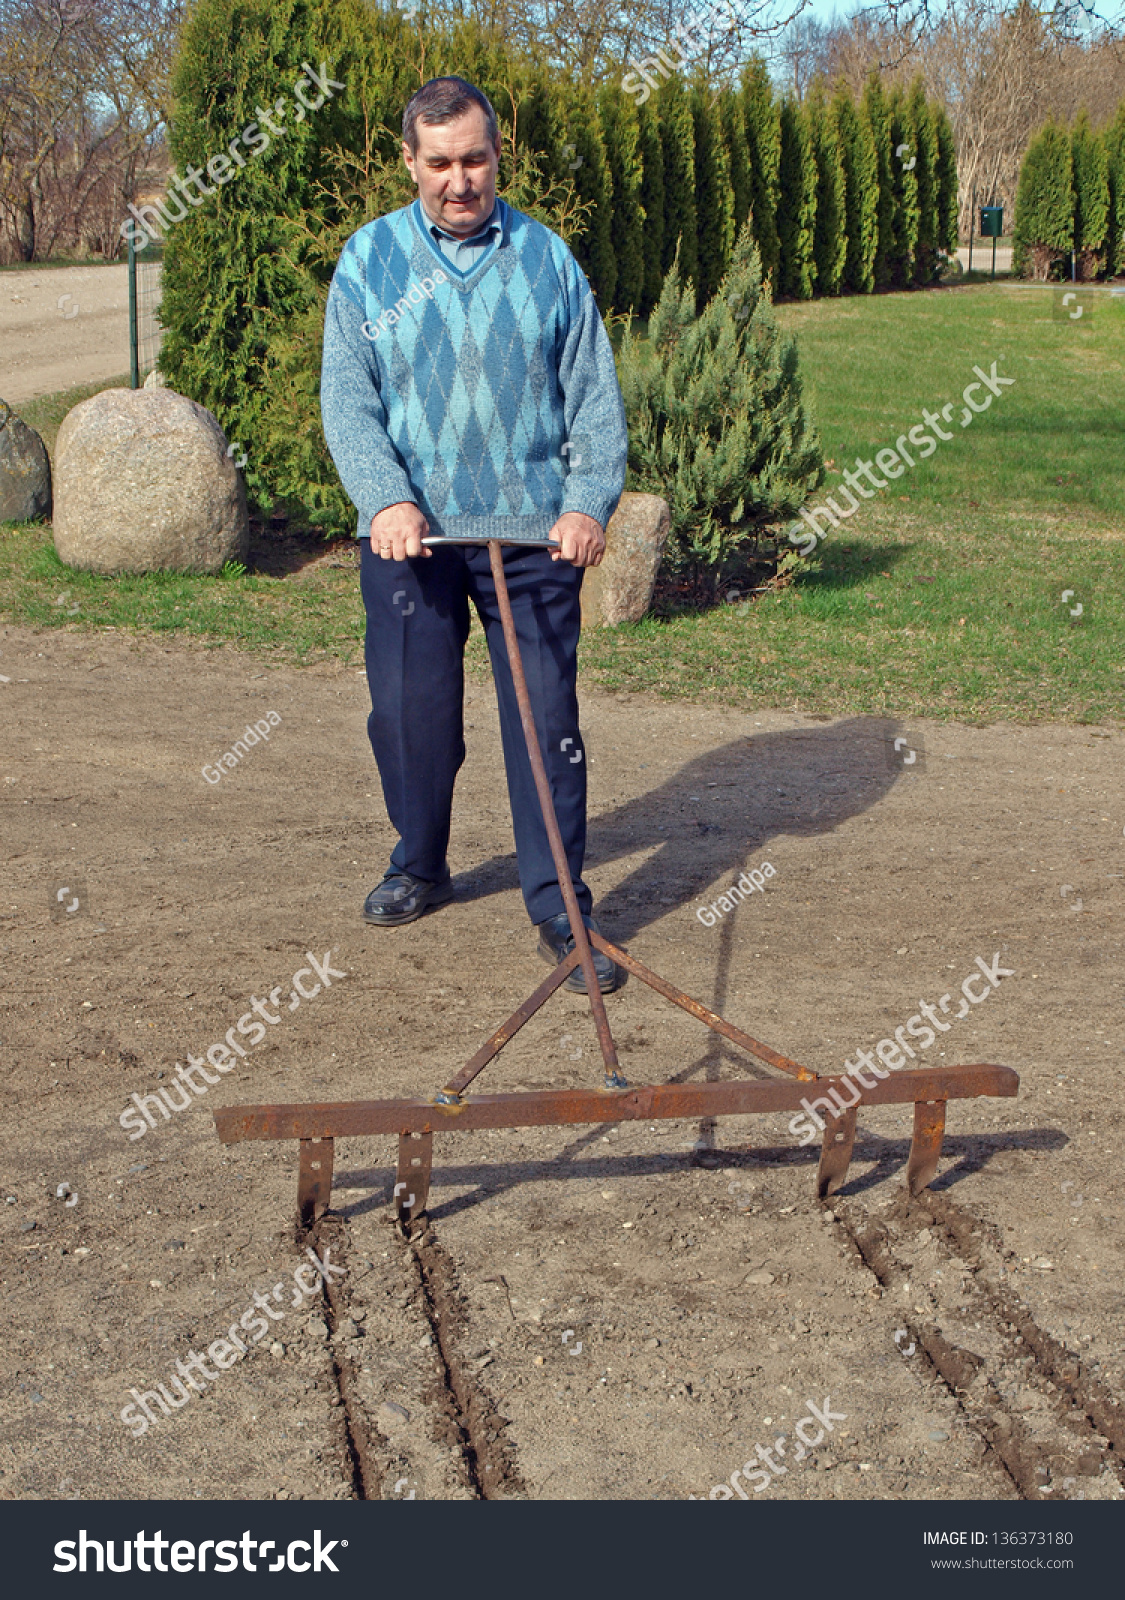 Seeding mature woman